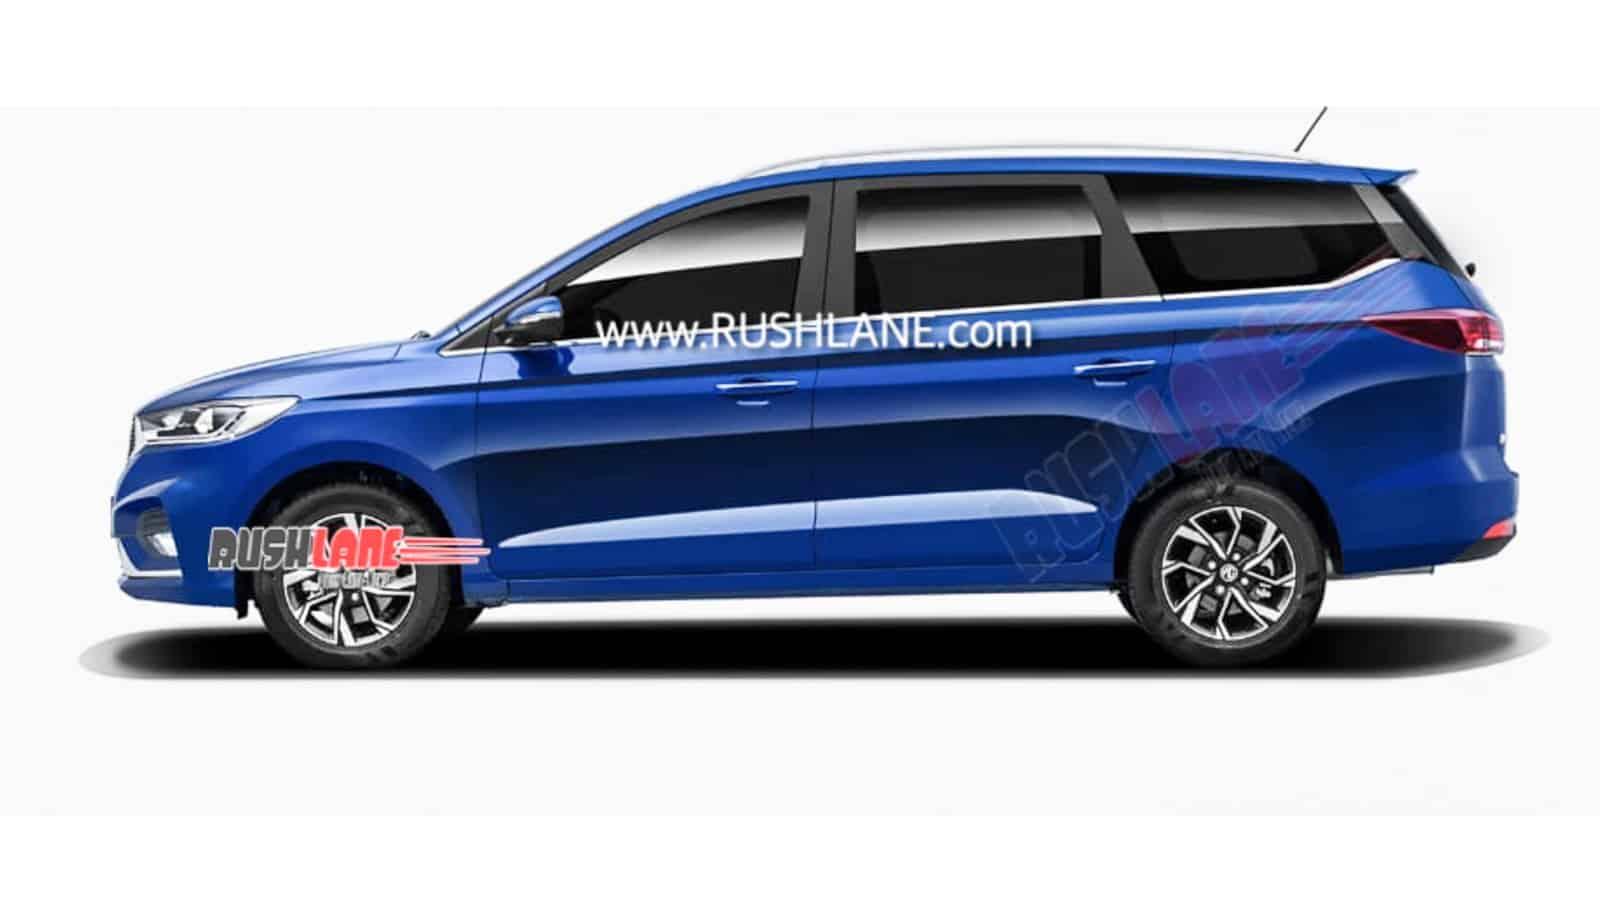 MG MPV for India 2020 Auto Expo